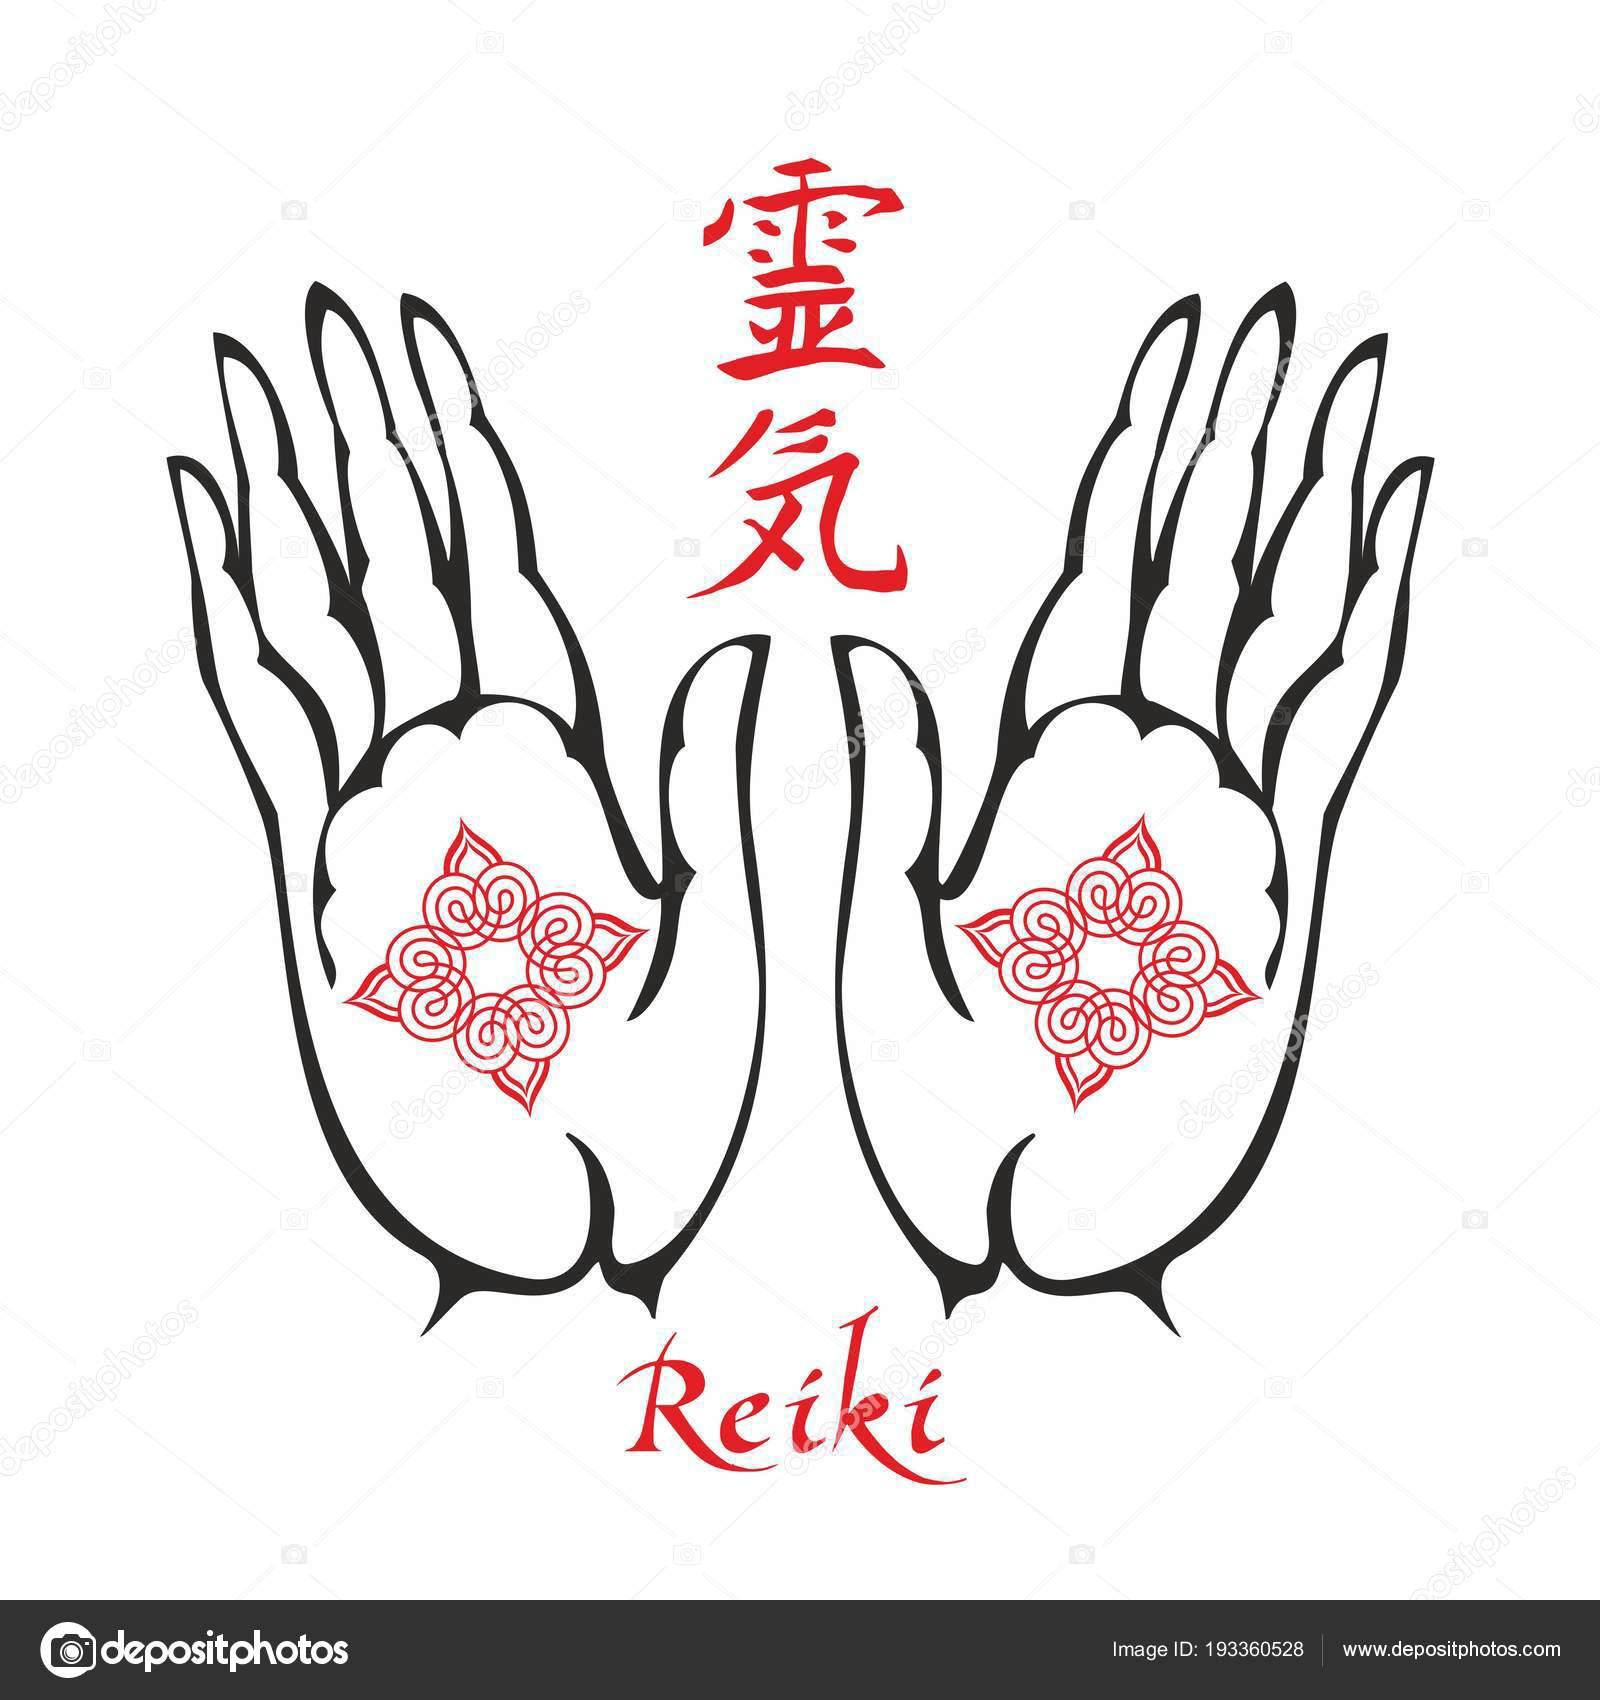 Reiki Symbol Sacred Sign Hieroglyph Denoting Divine Energy Spiritual